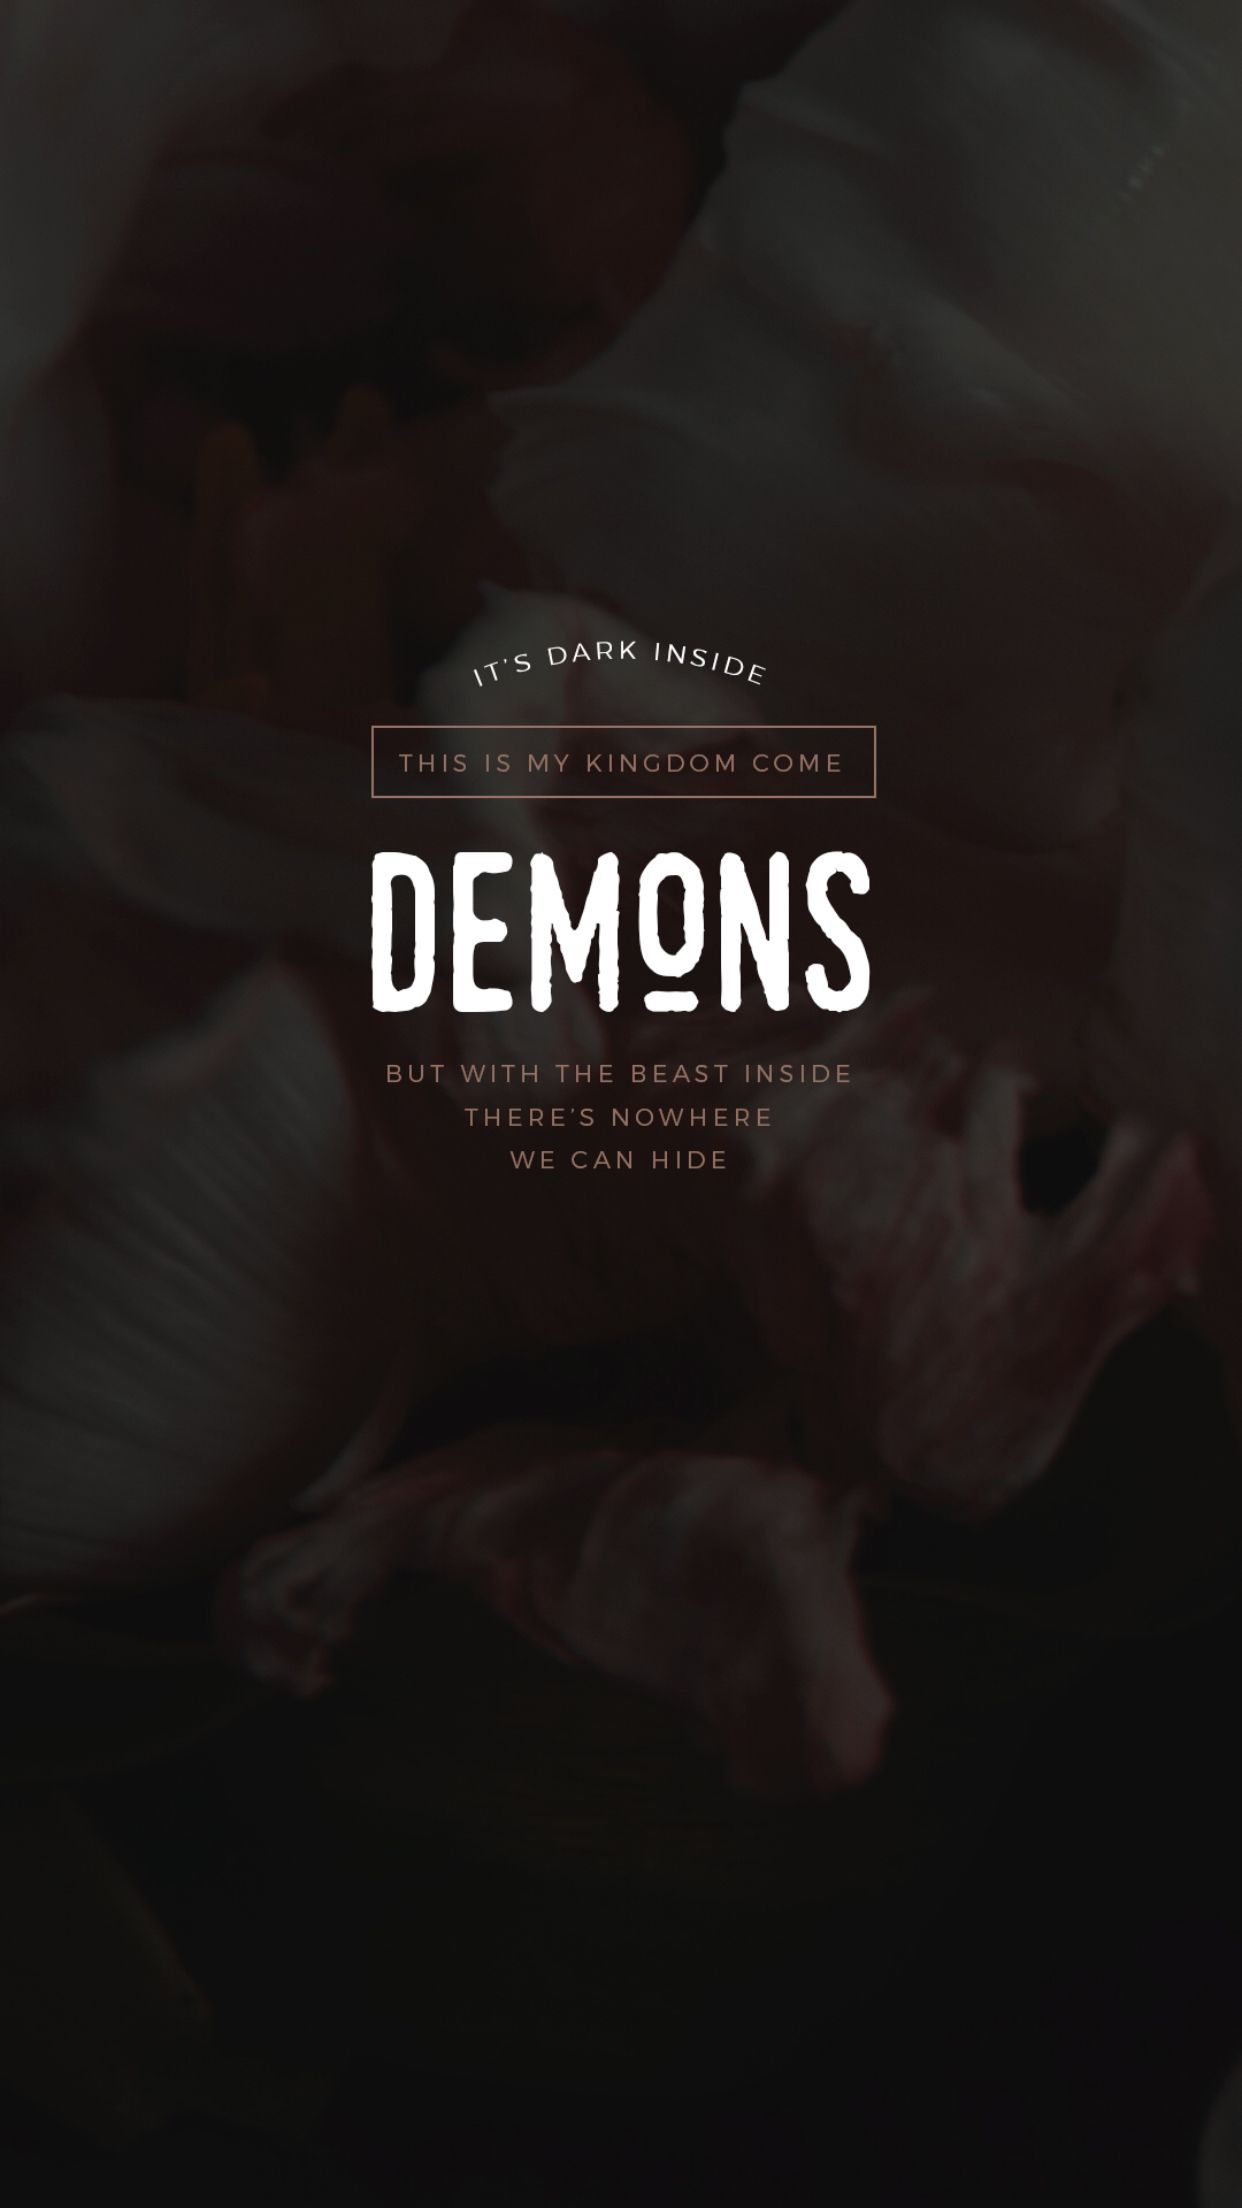 Fob Wallpaper Fall Out Boy Demons Lyrics Imagine Dragons Imagine Dragons Lyrics